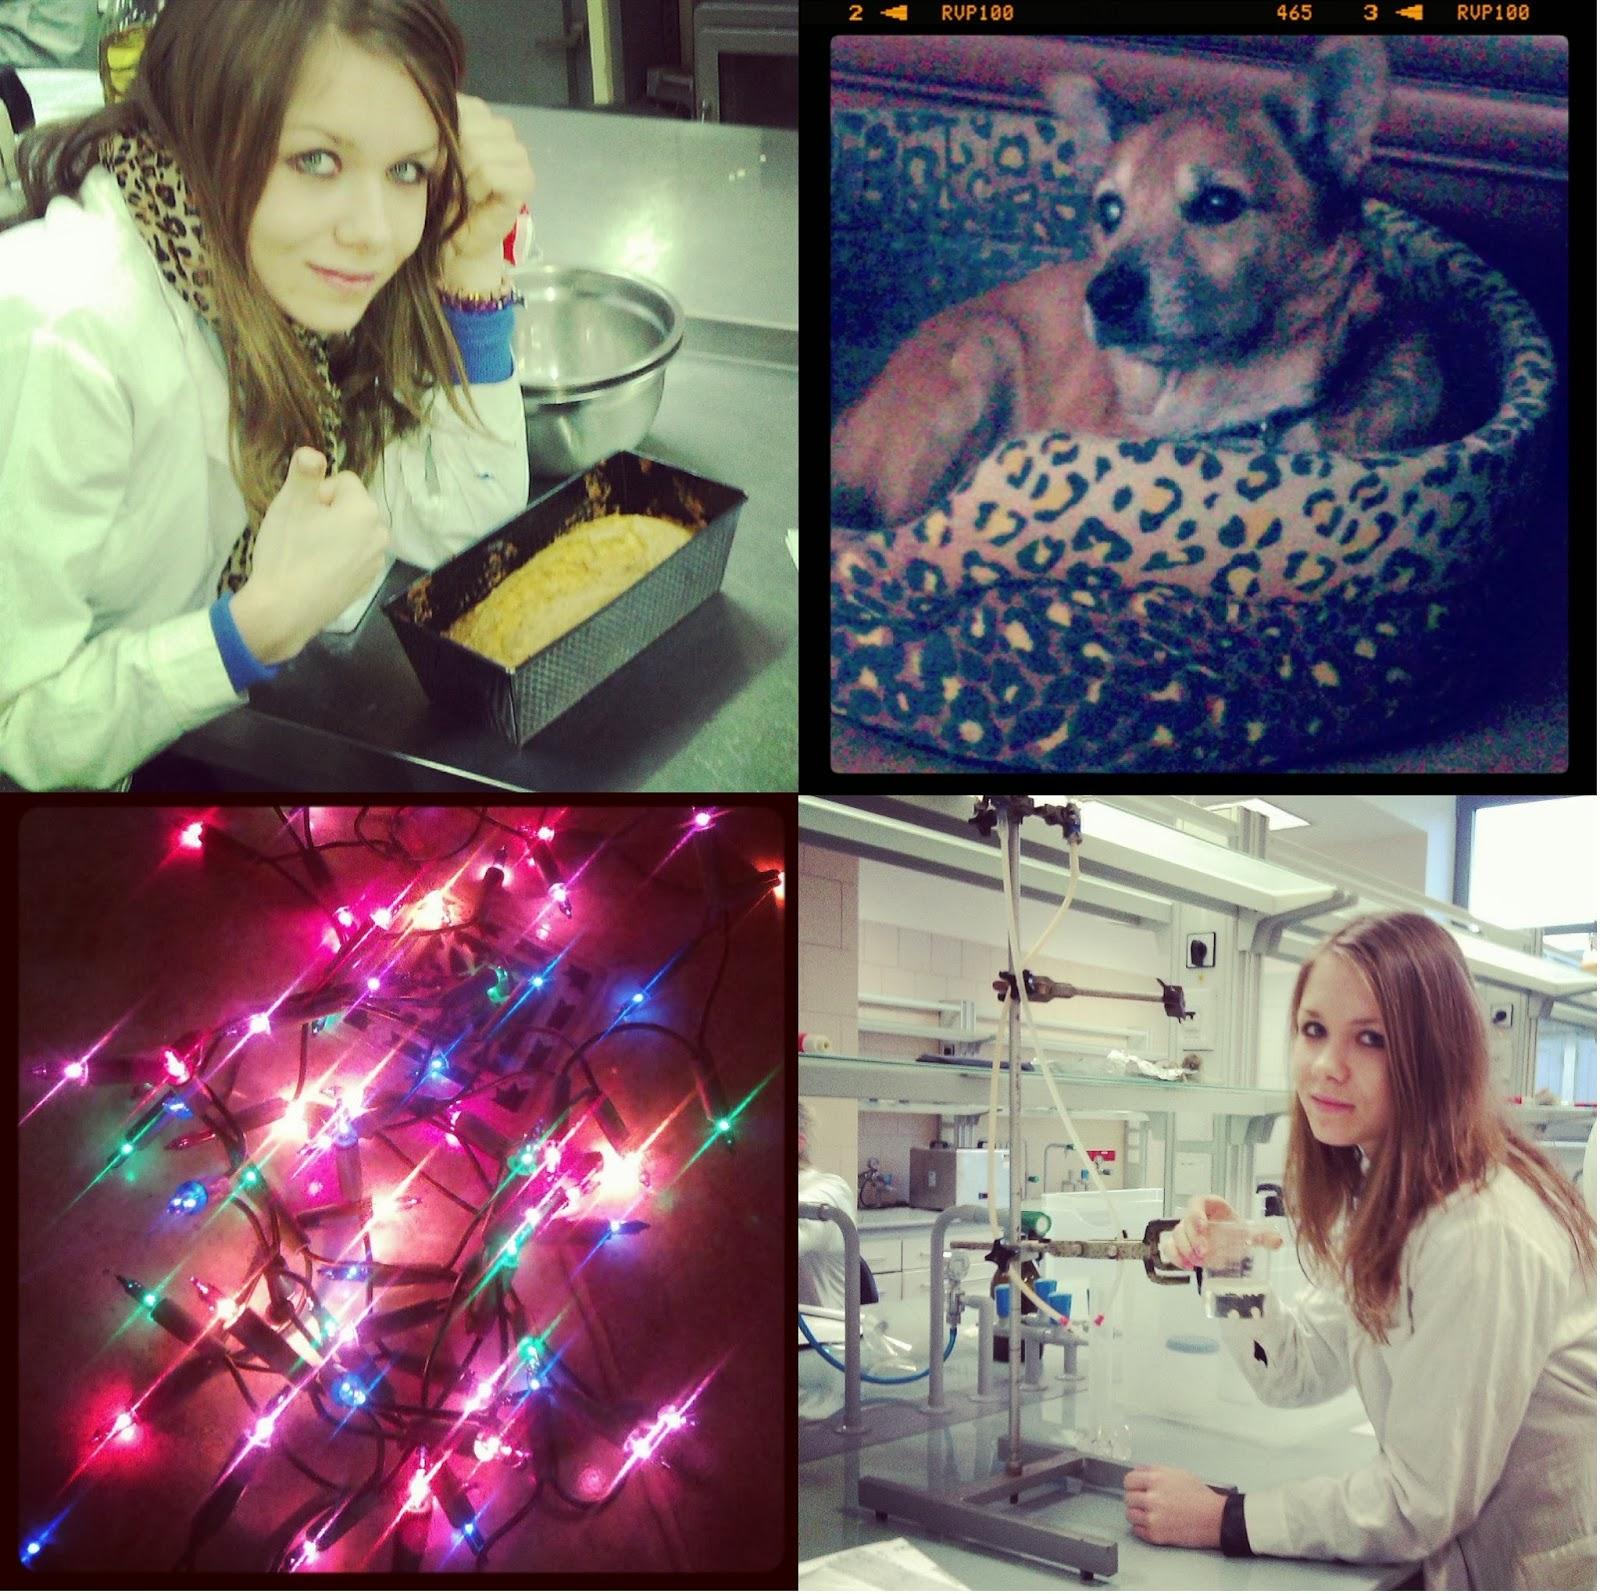 laboratorium szczecin